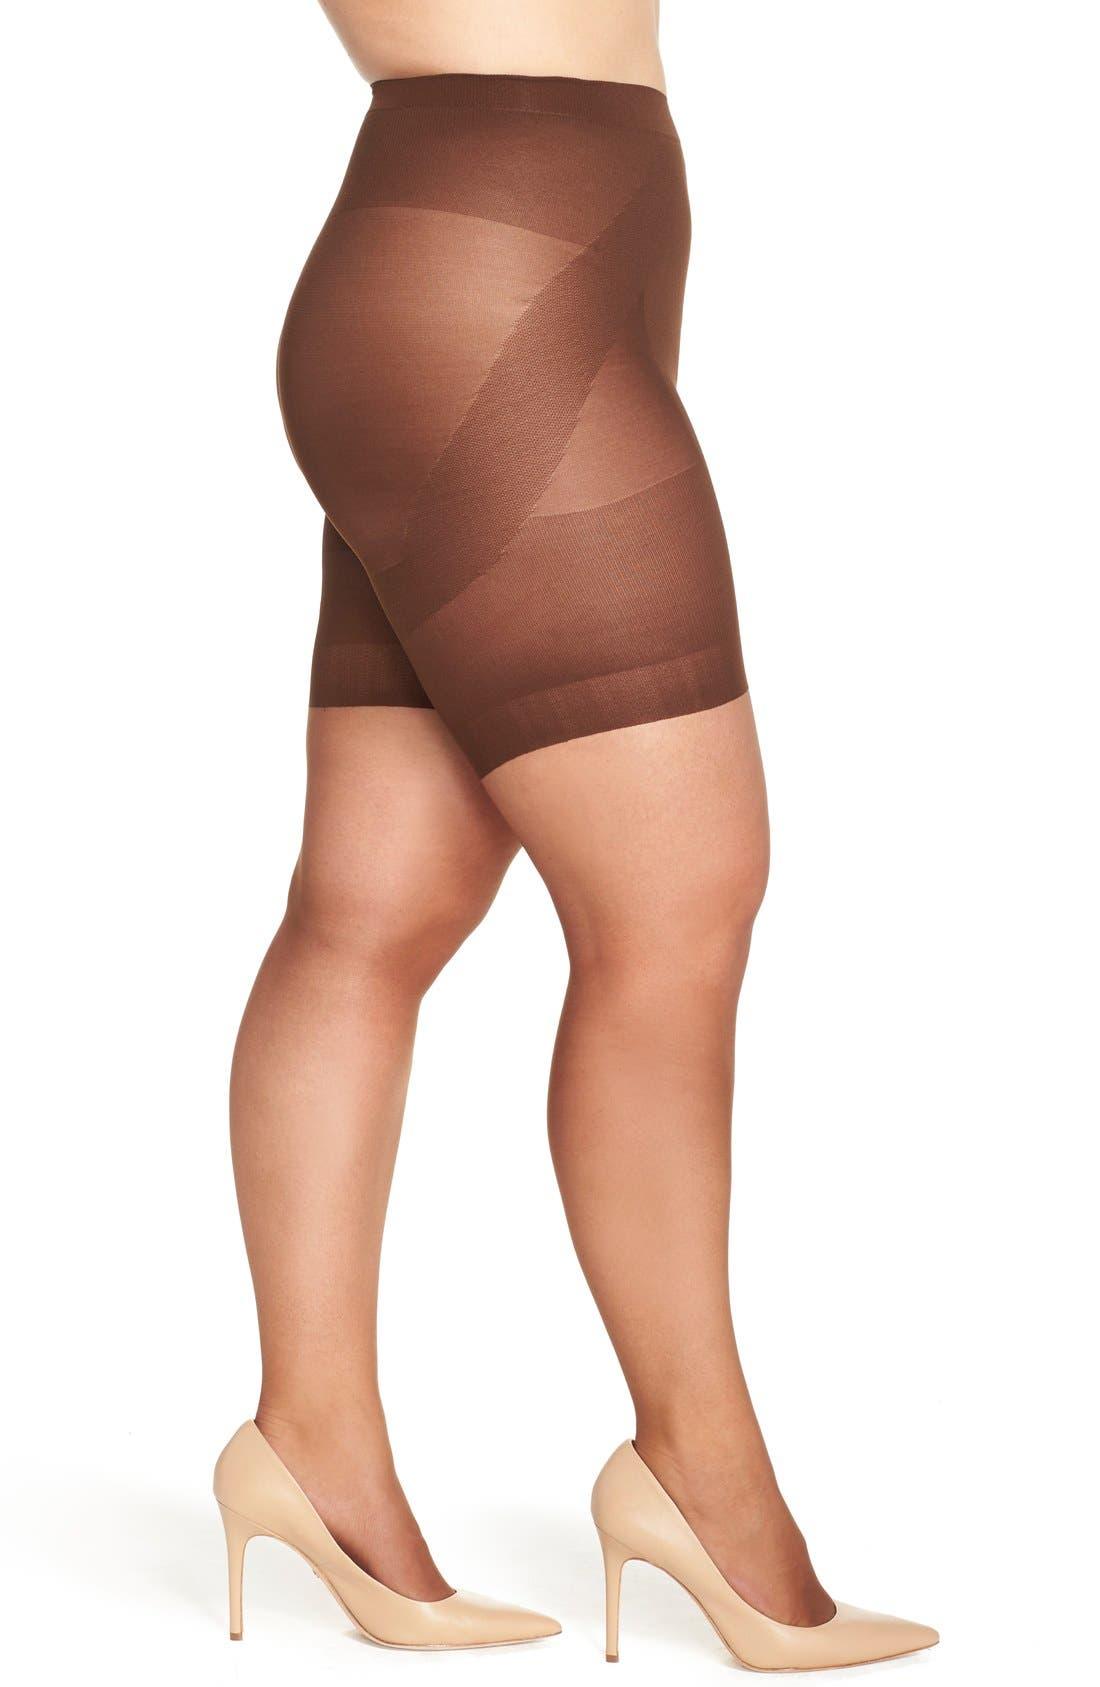 Berkshire Booster Pantyhose (Plus Size)